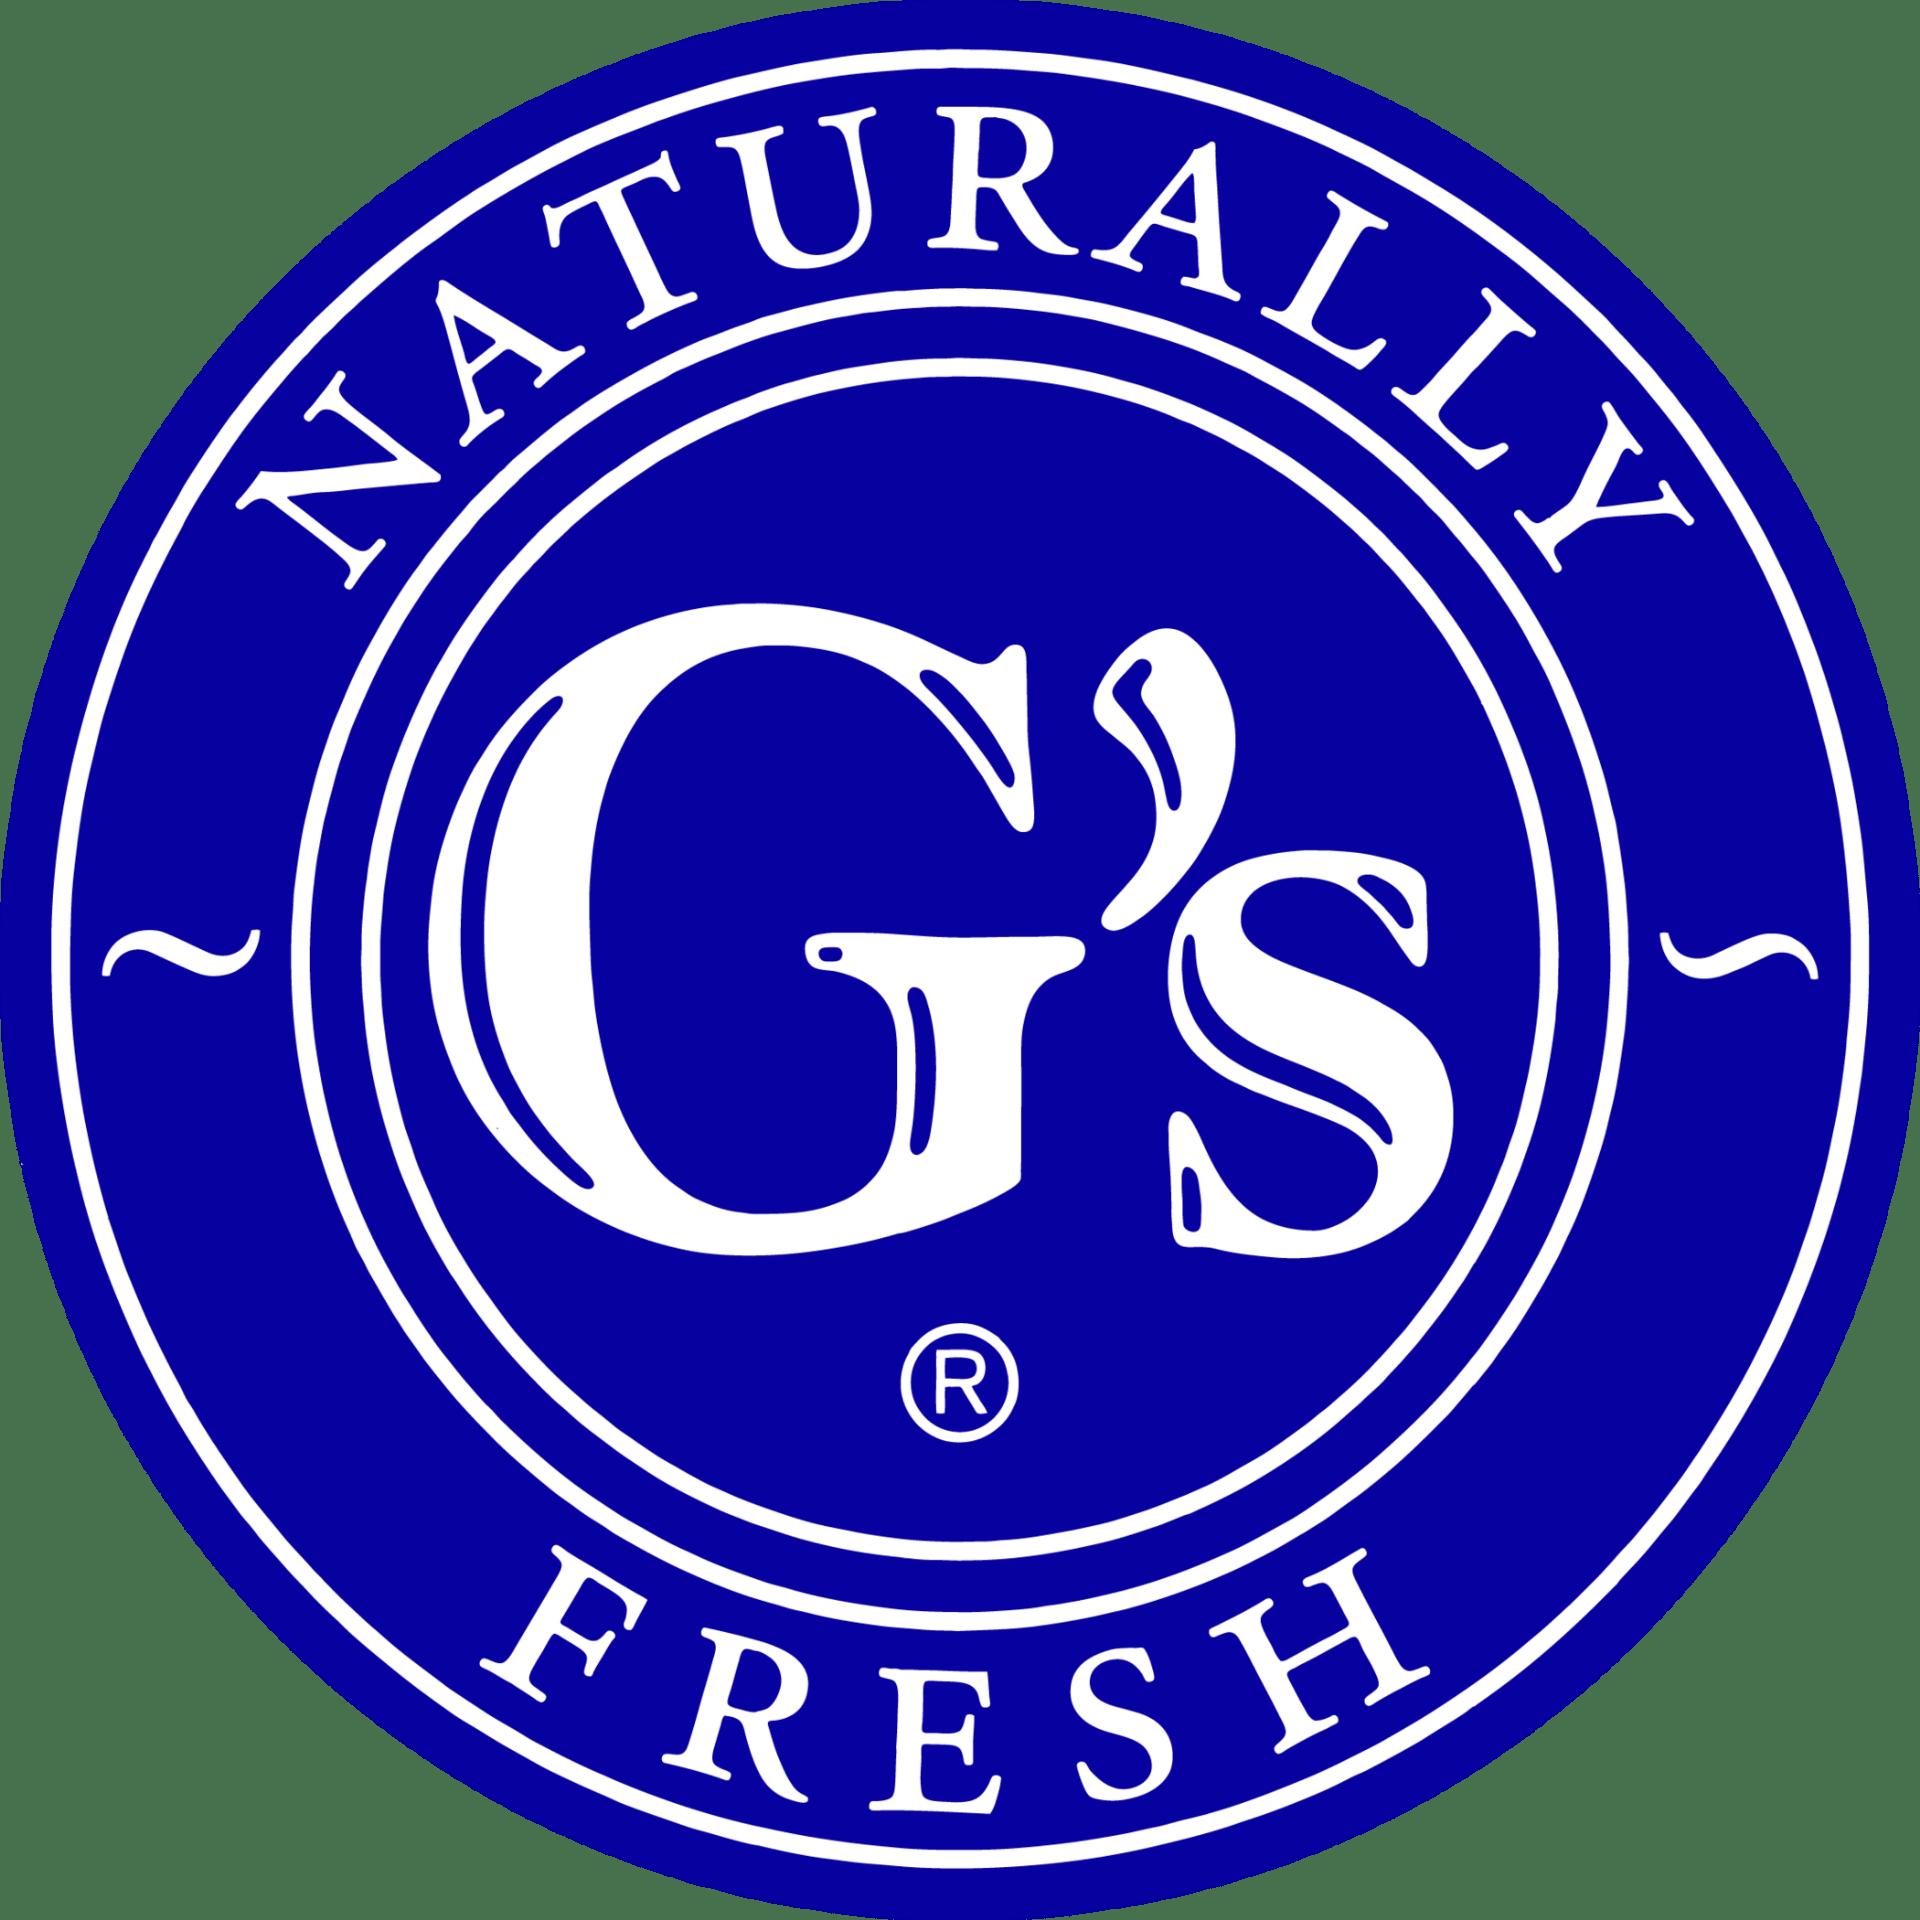 G S Fresh logo